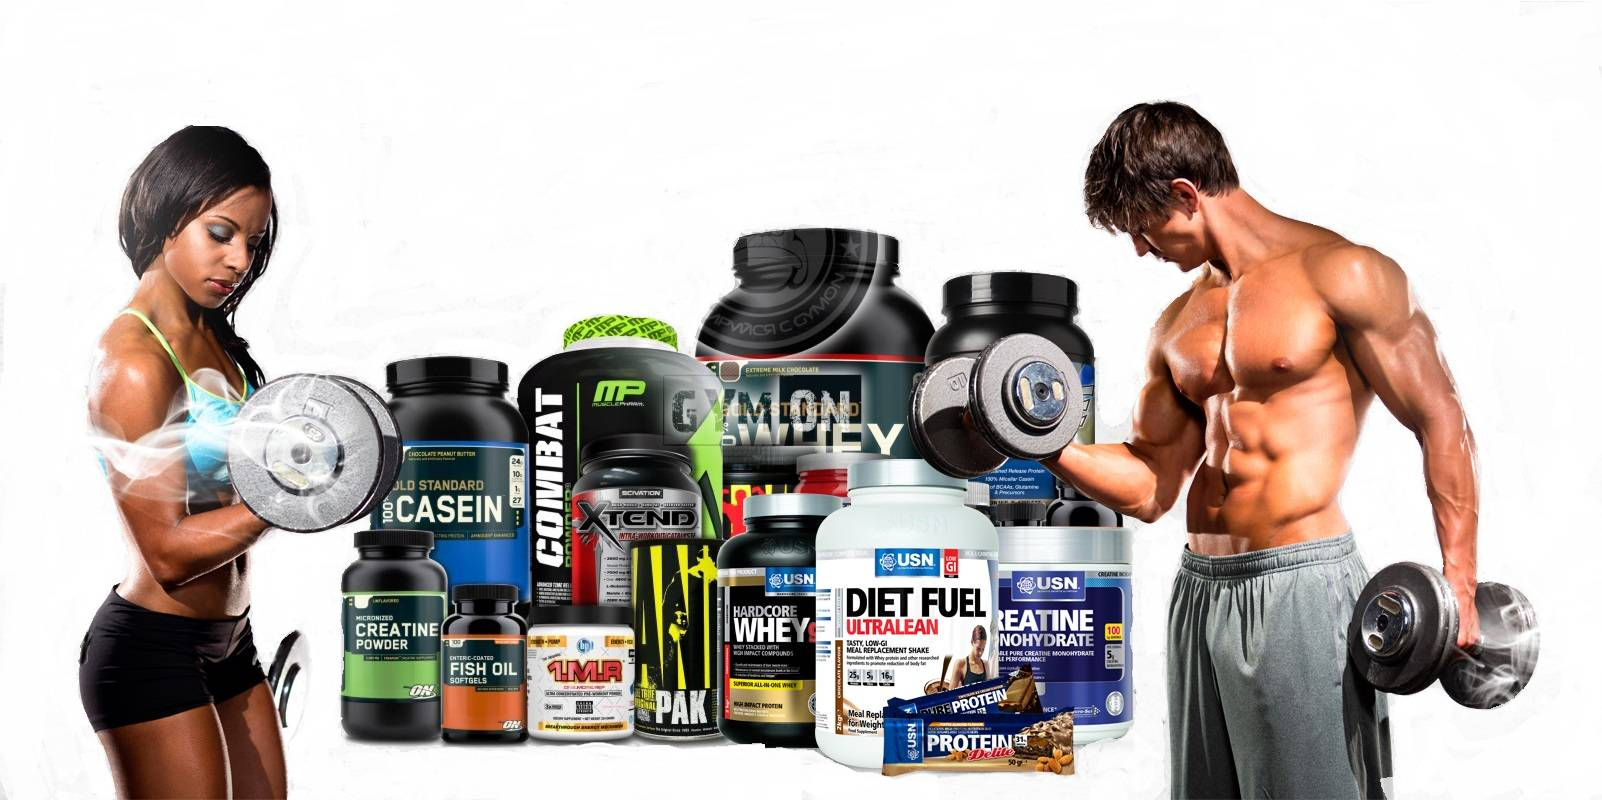 Мифы о спортивном питании: вреден ли протеин?